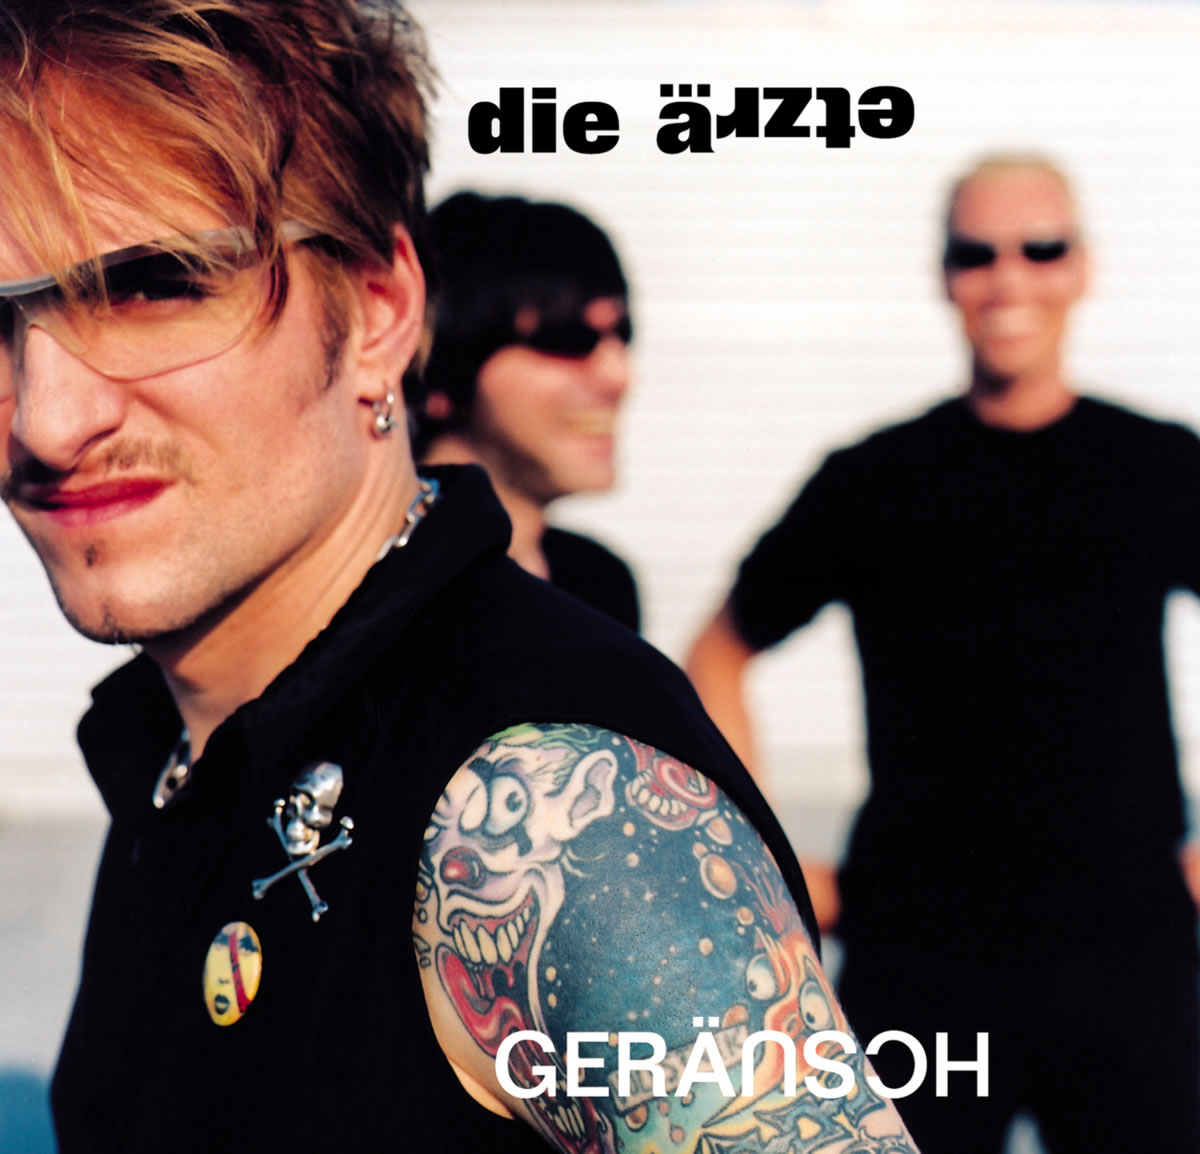 http://hitparade.ch/cdimages/die_aerzte-geraeusch_a.jpg